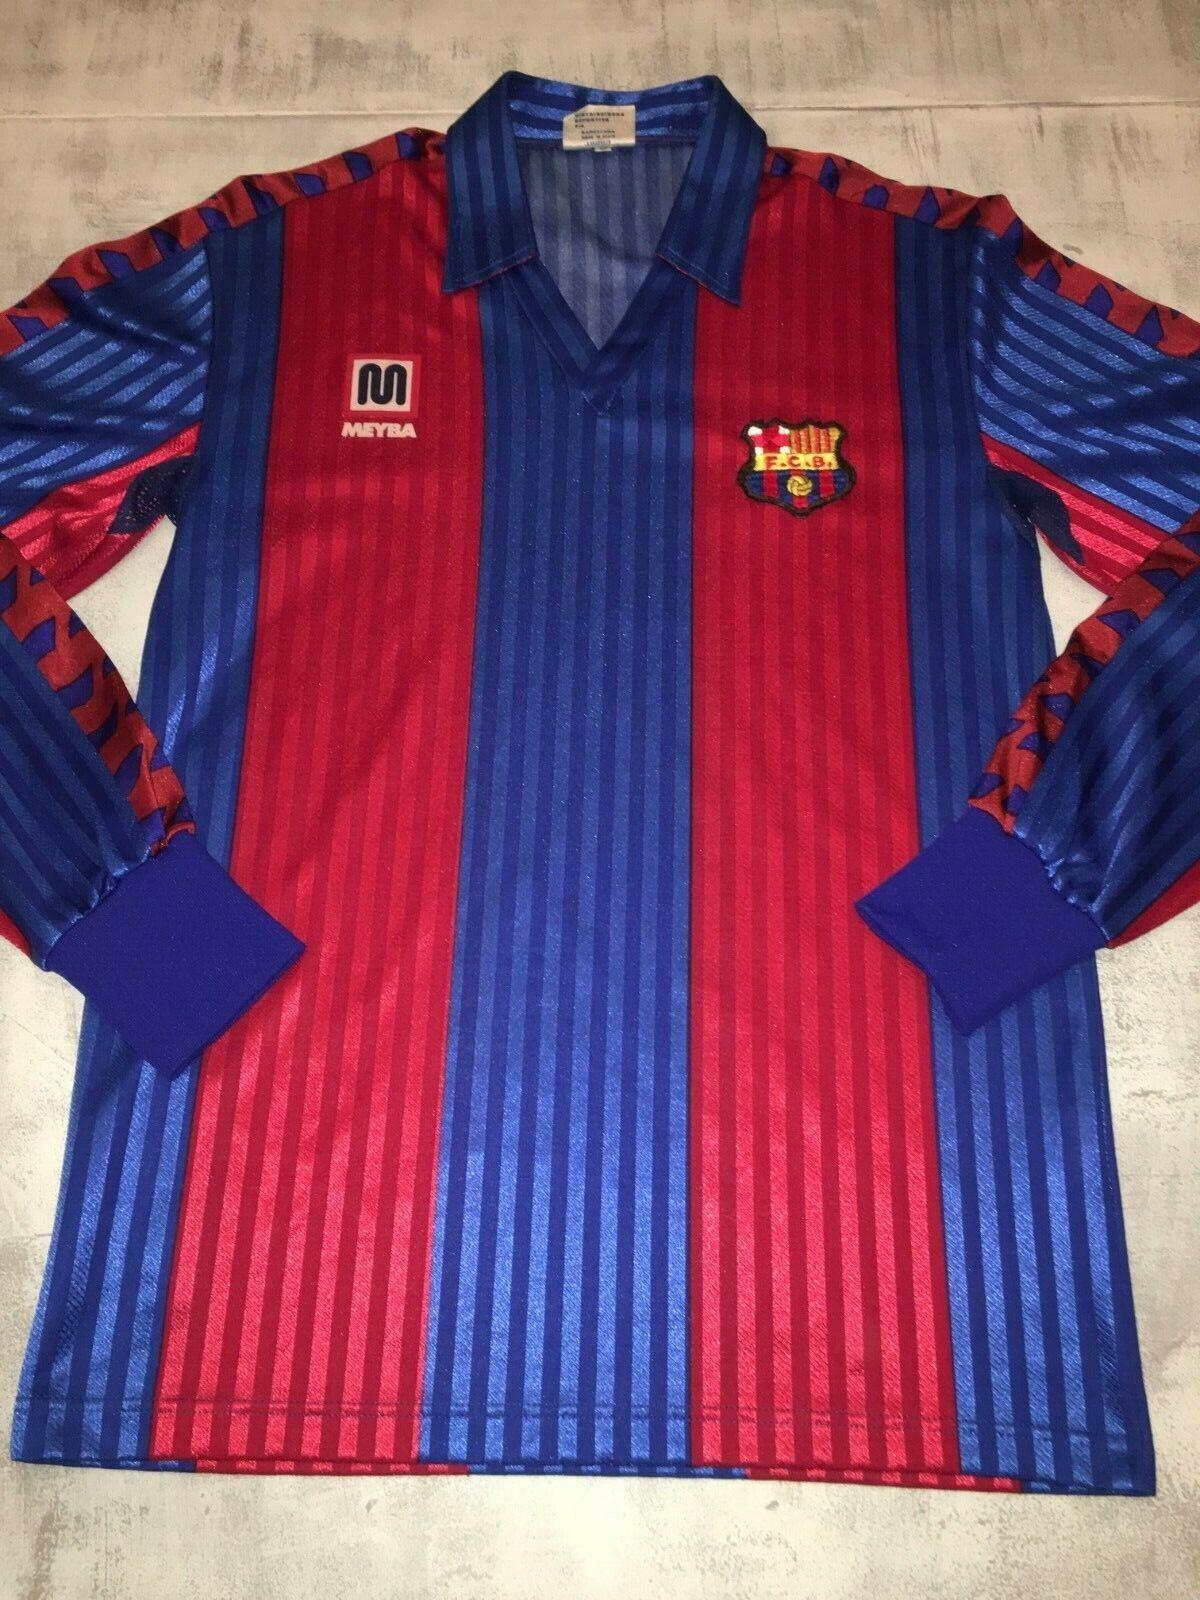 MEYBA FC Barcelona 19901992 Shirt S Dimensione